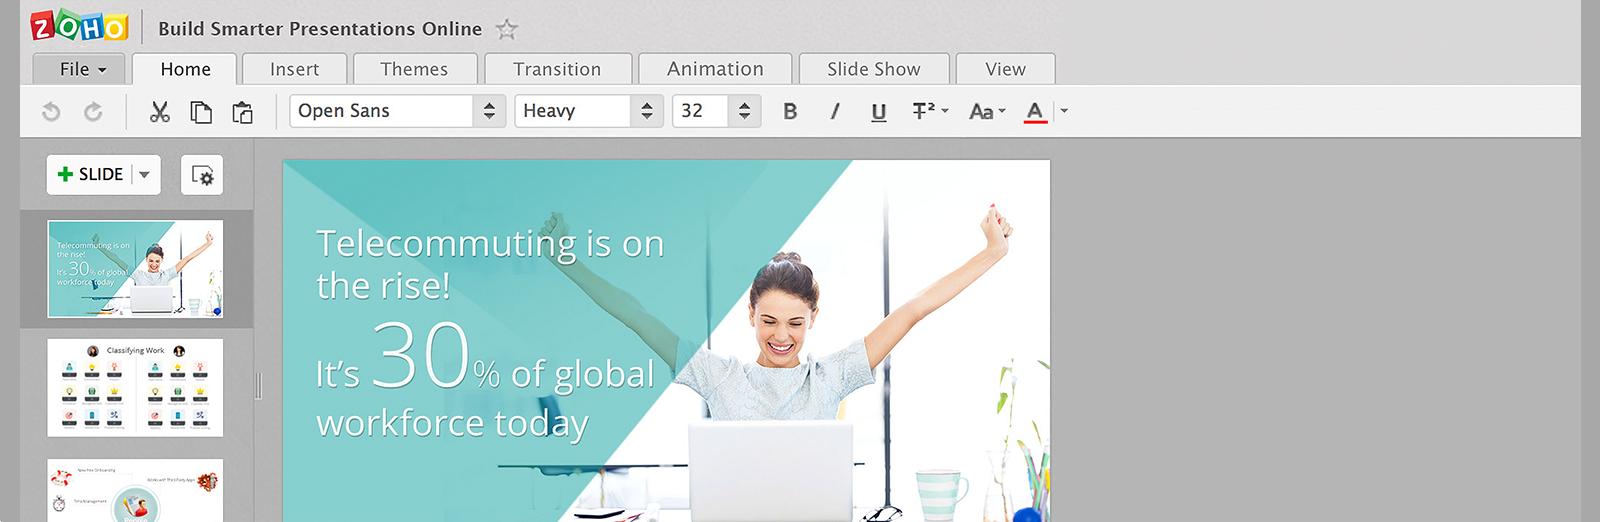 Zoho Show - Online Presentation Application